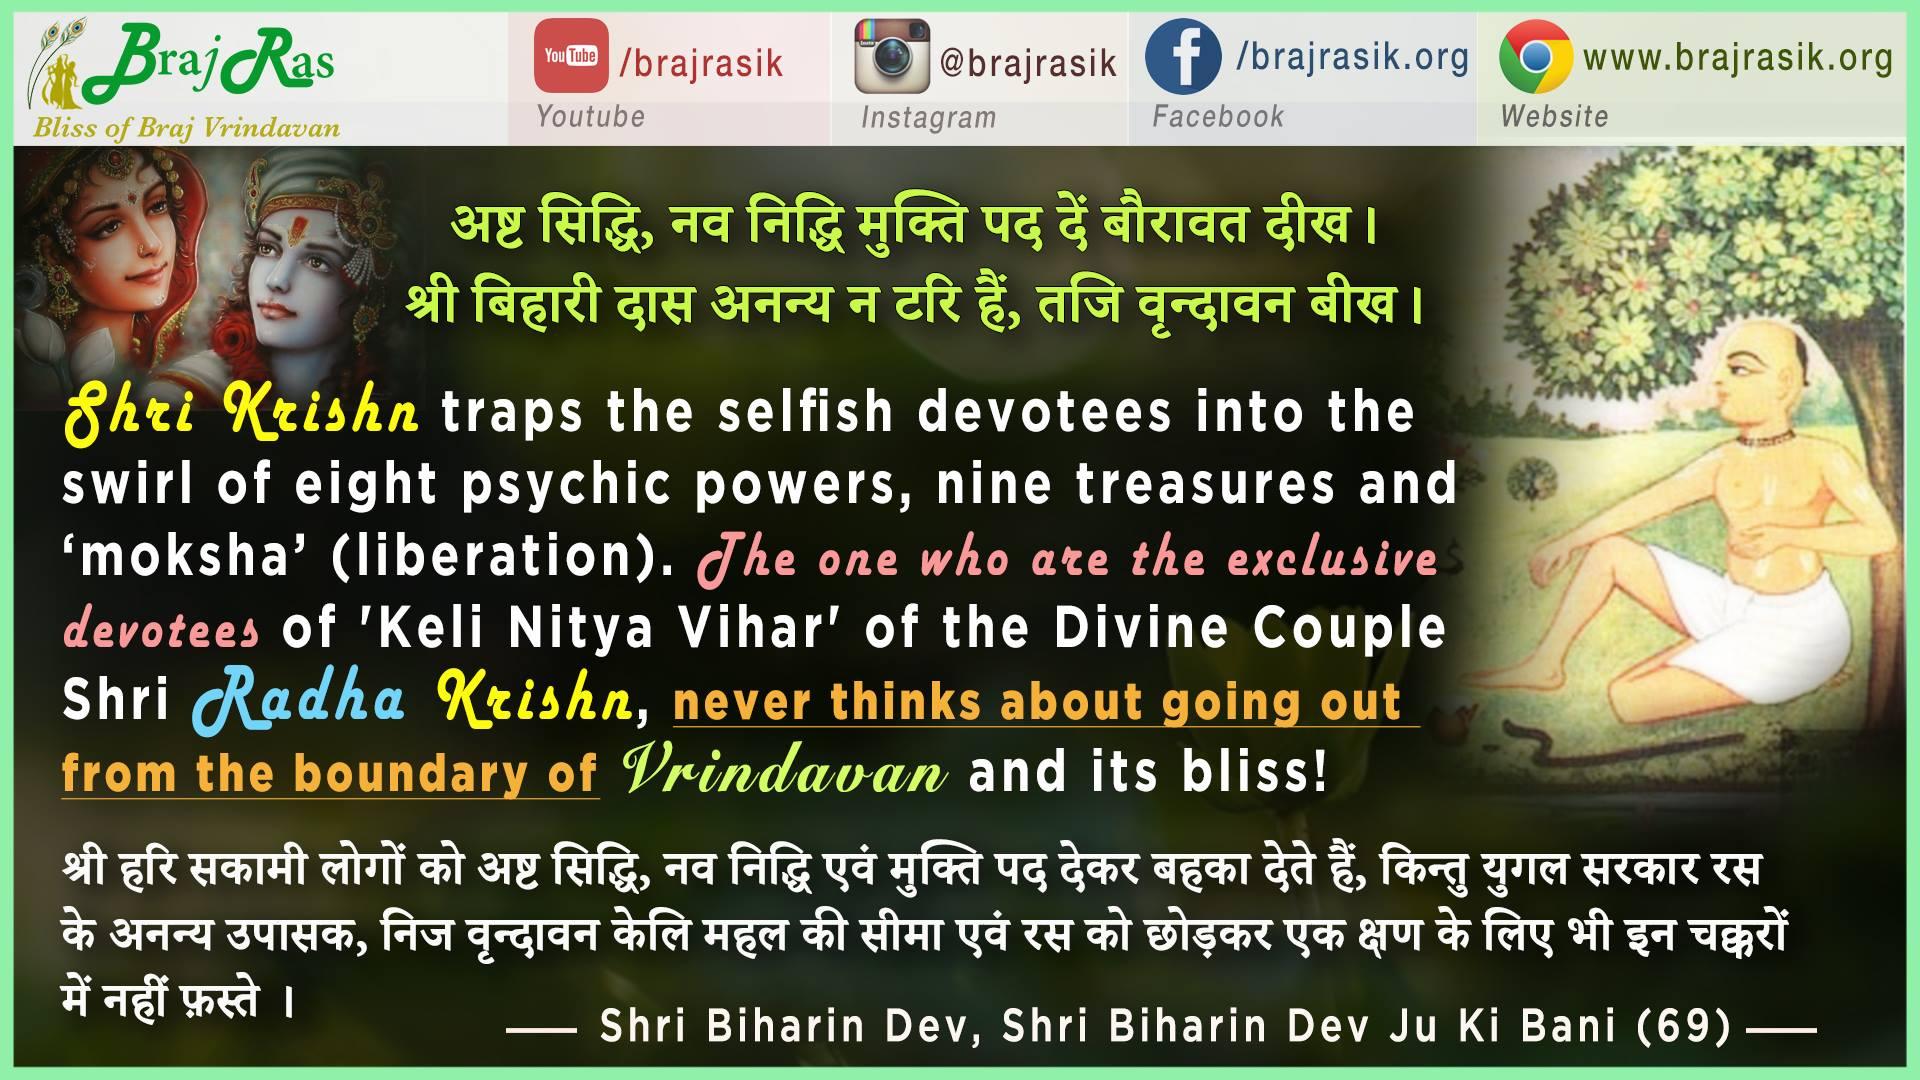 Ashta Sidhi, Nav Nidhi Mukti Pad Dein Bauravat Deekh - Shri Biharin Dev Ji, Shri Biharin Dev Ji Ki Vani (69)